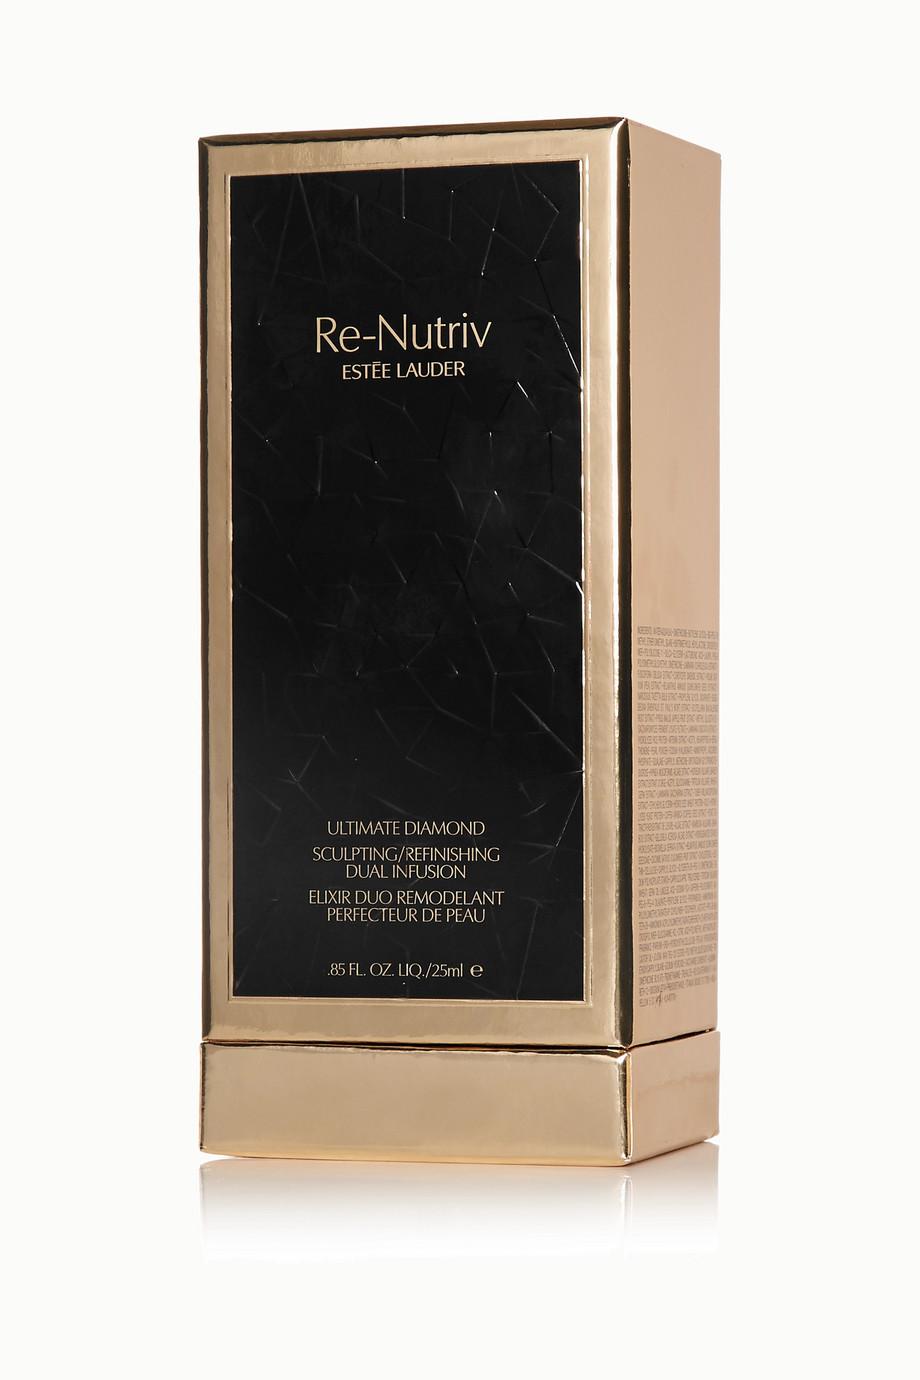 Estée Lauder Re-Nutriv Ultimate Diamond Sculpting Refinishing Dual Infusion Serum, 25ml